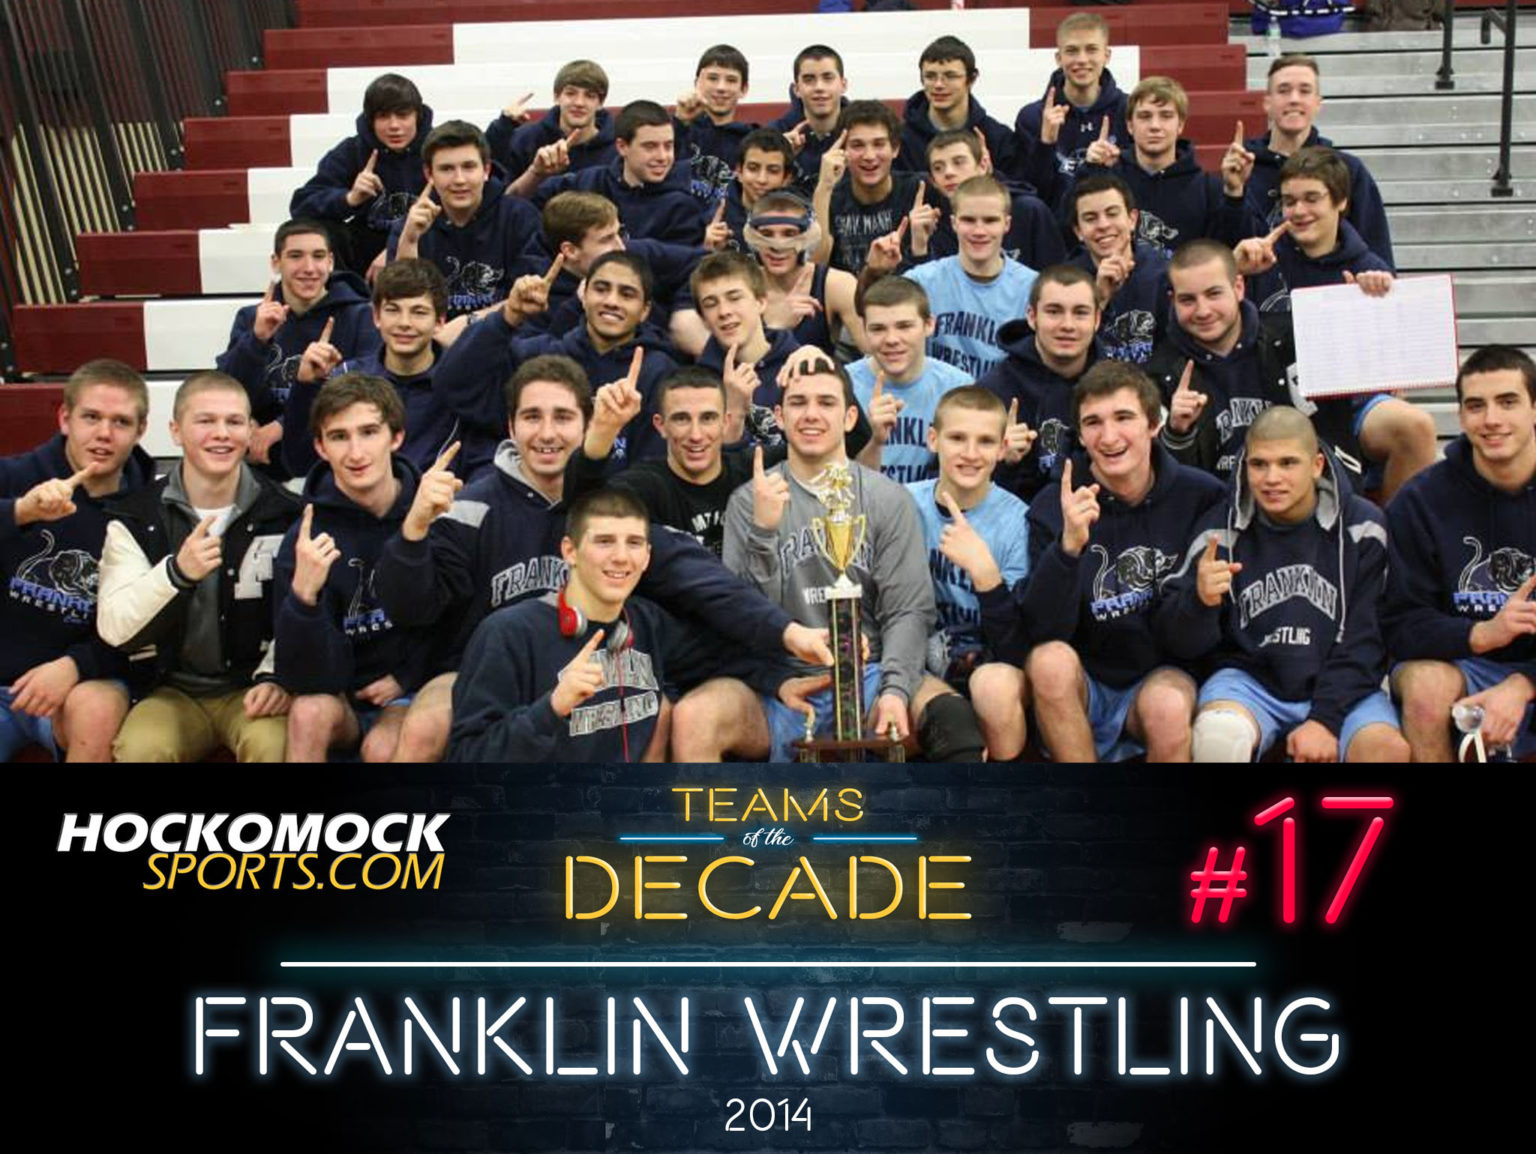 HockomockSports.com: Teams of the Decade #17: 2014 Franklin Wrestling